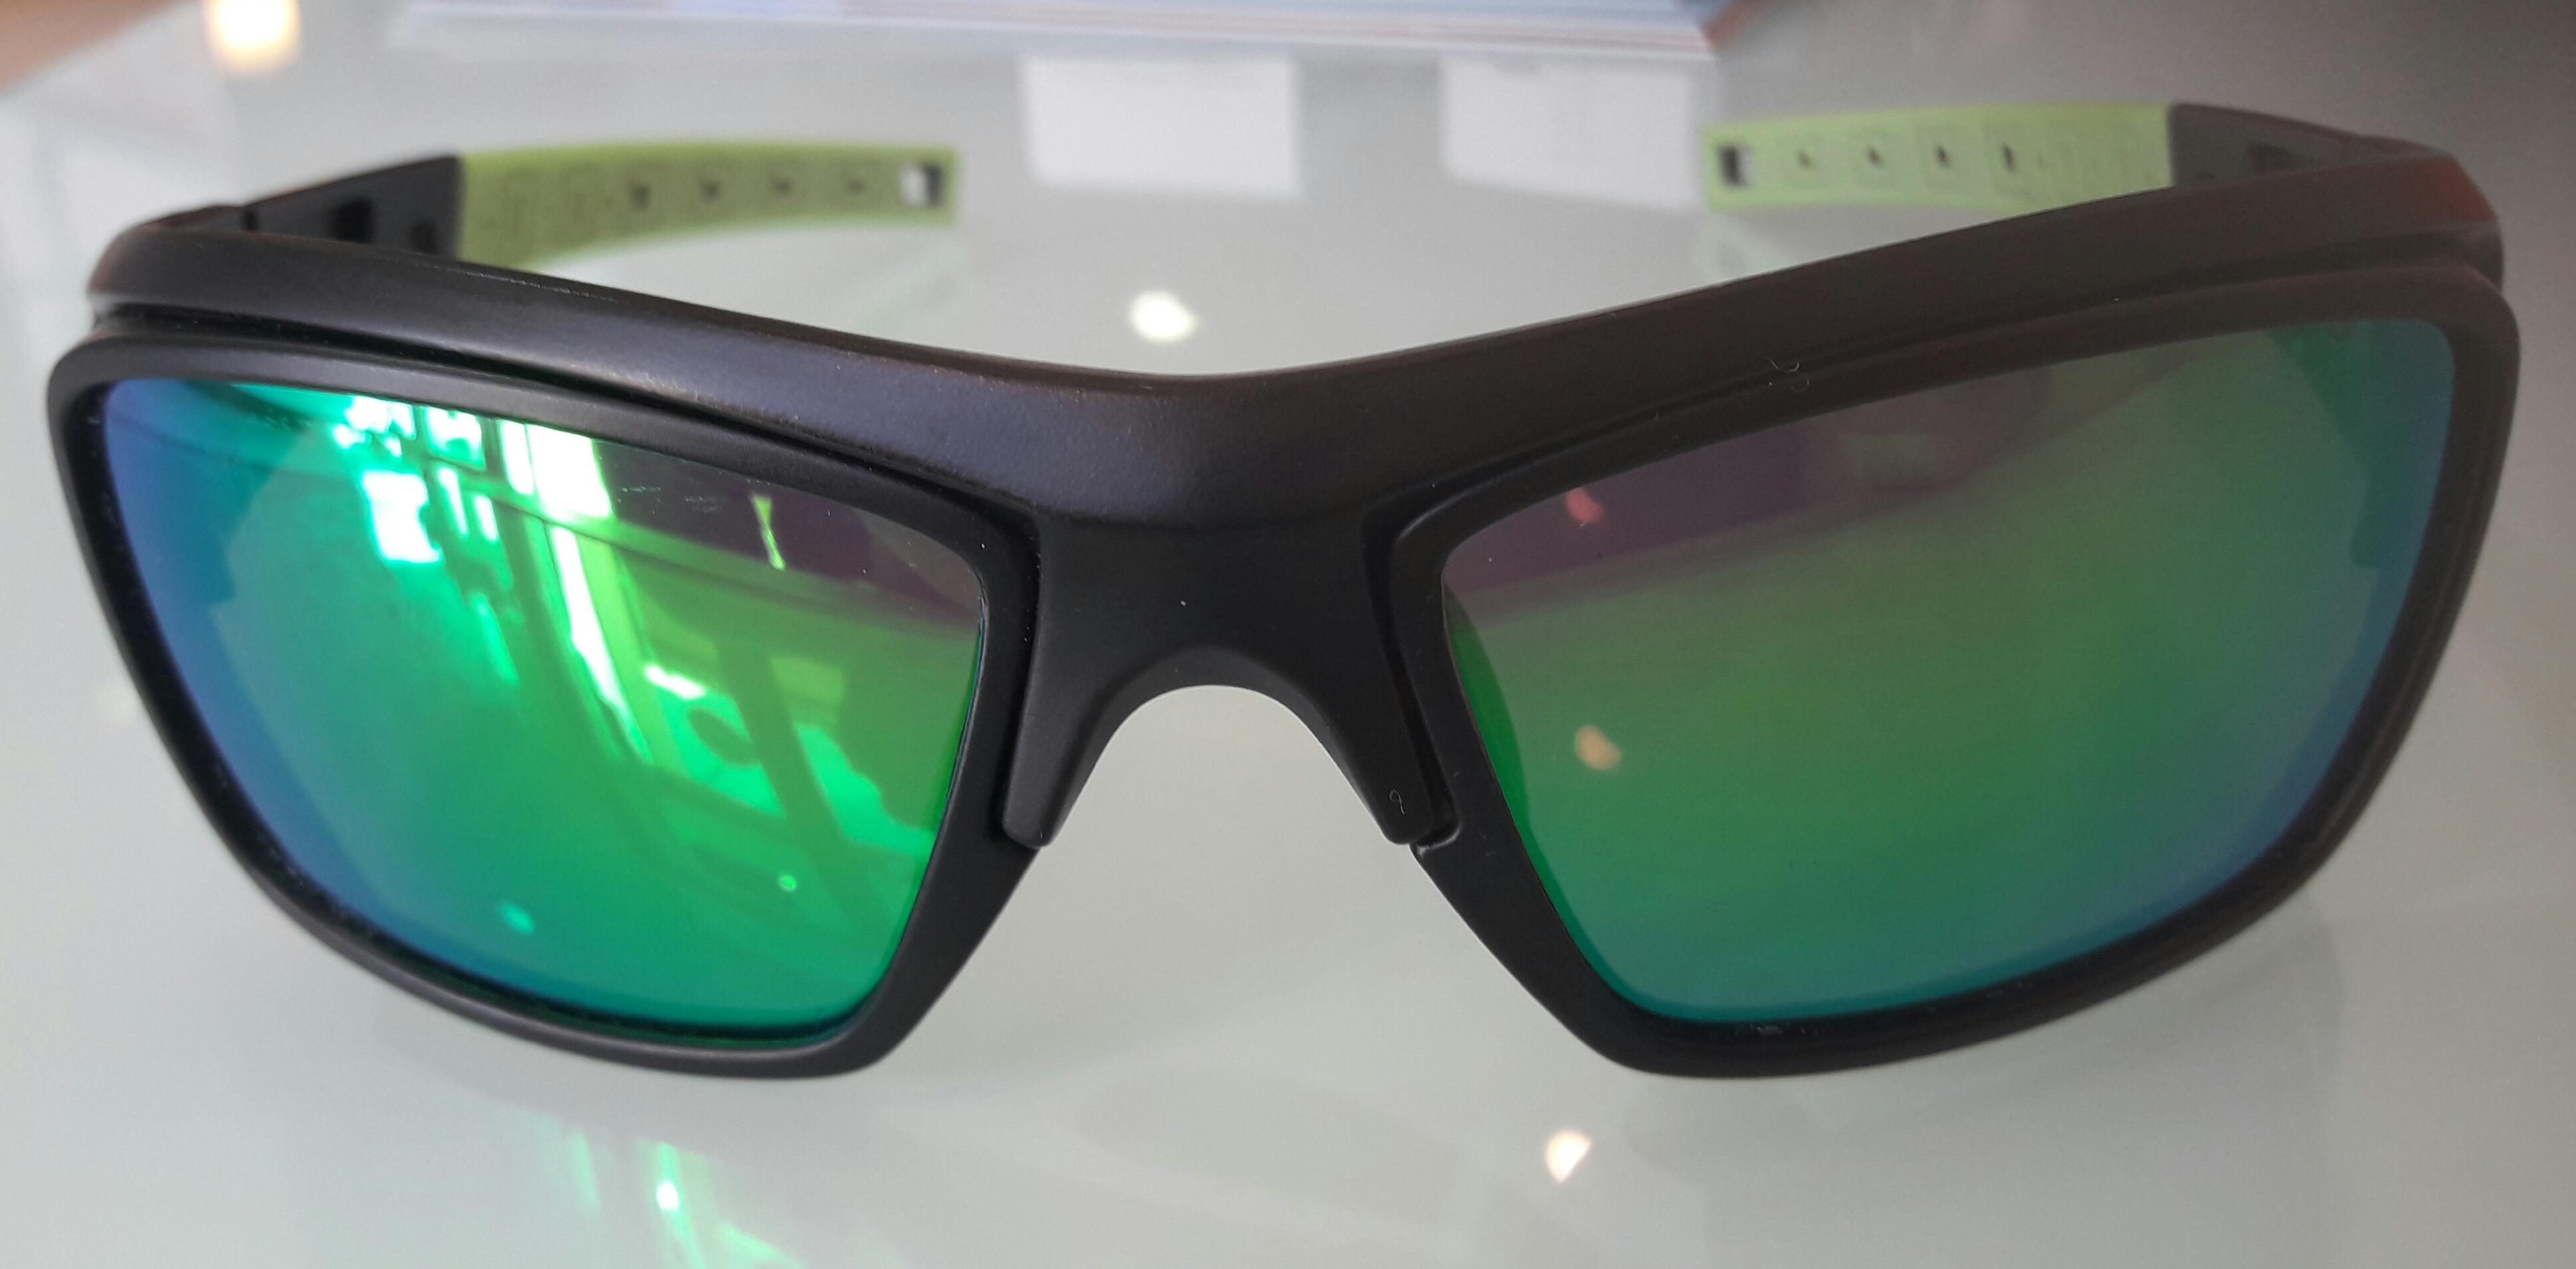 styrpe sty 02 fotocromatica black green frontal